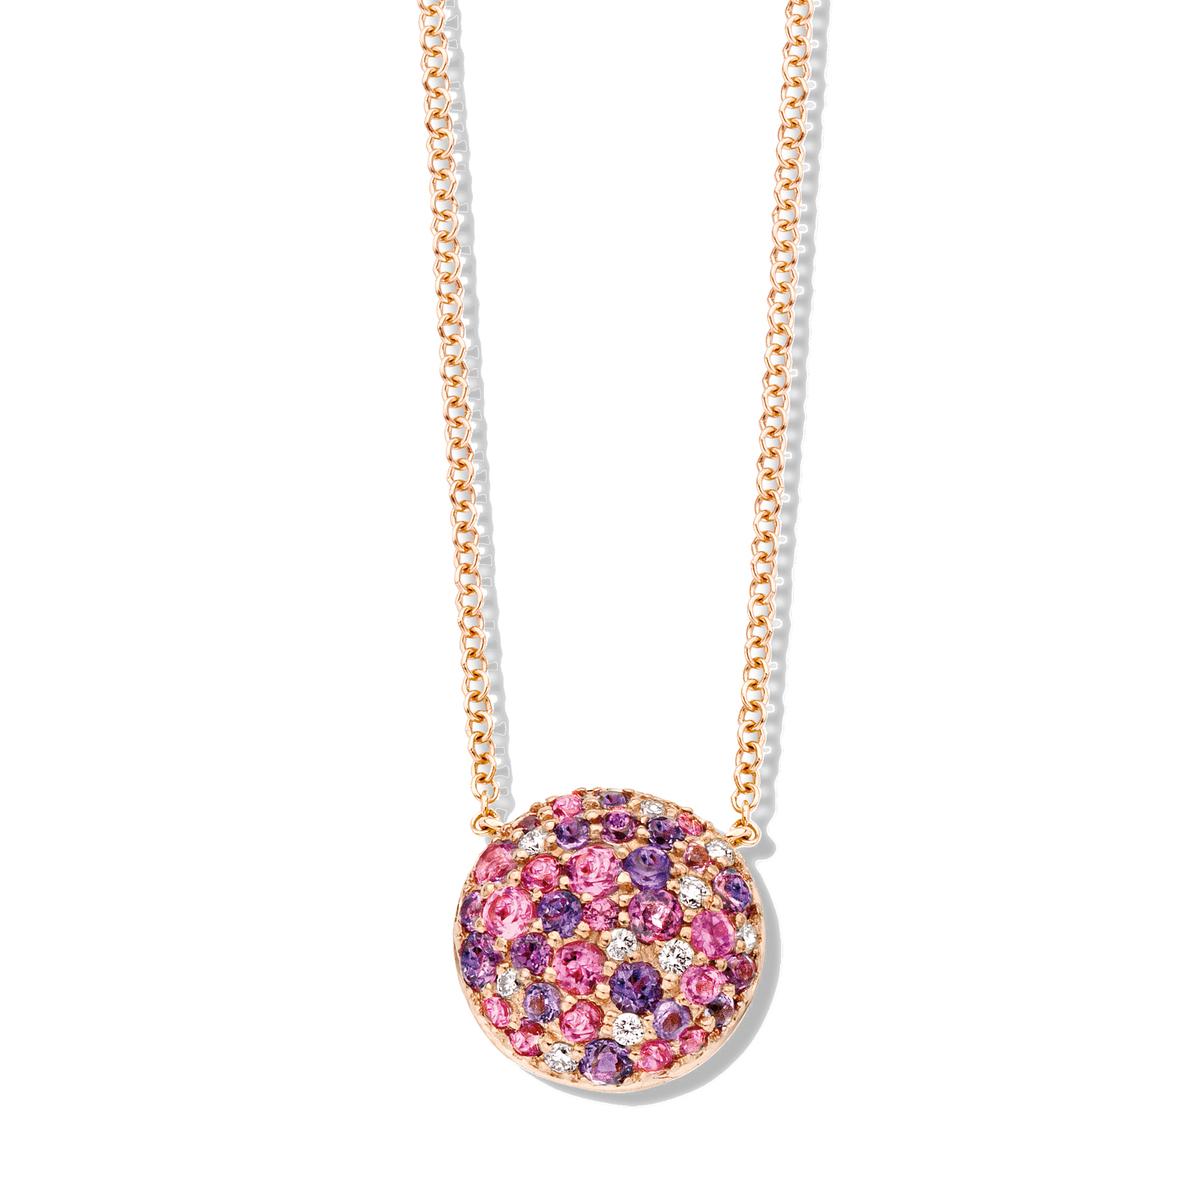 panarea necklace in rose gold